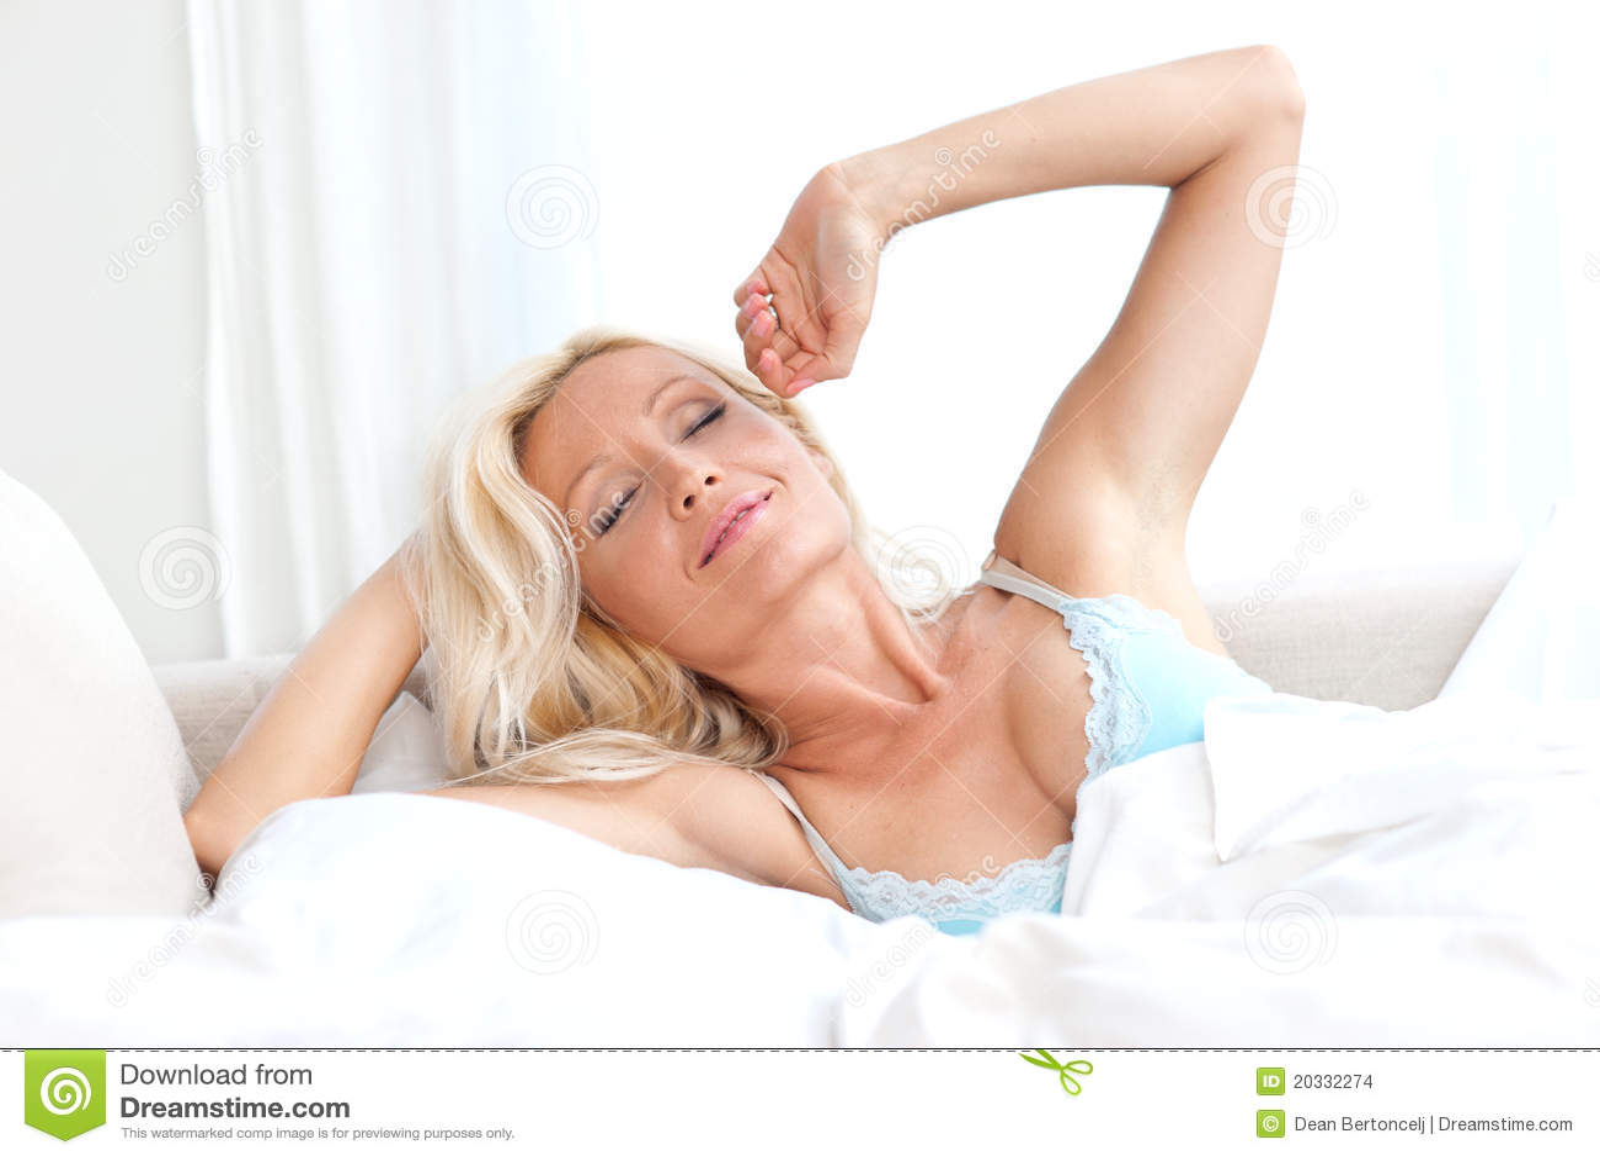 seks-s-voennimi